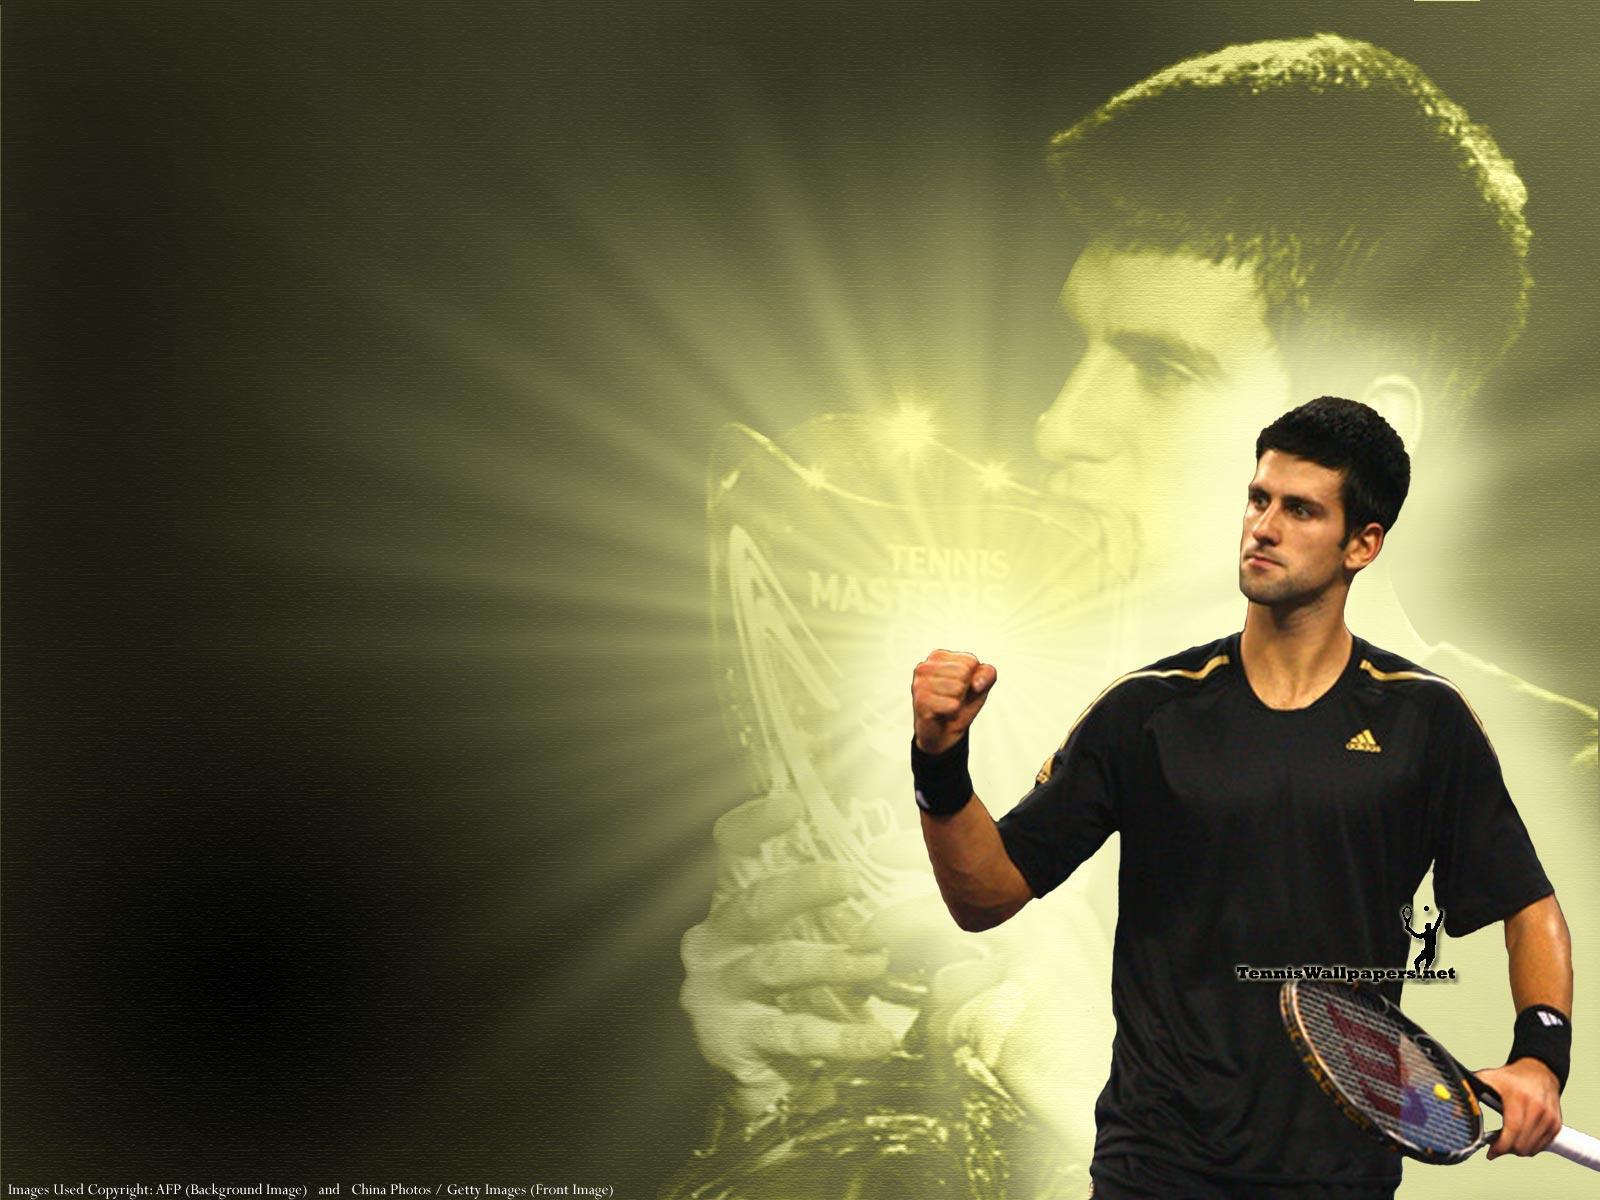 Novak Djokovic Wallpapers 1600x1200